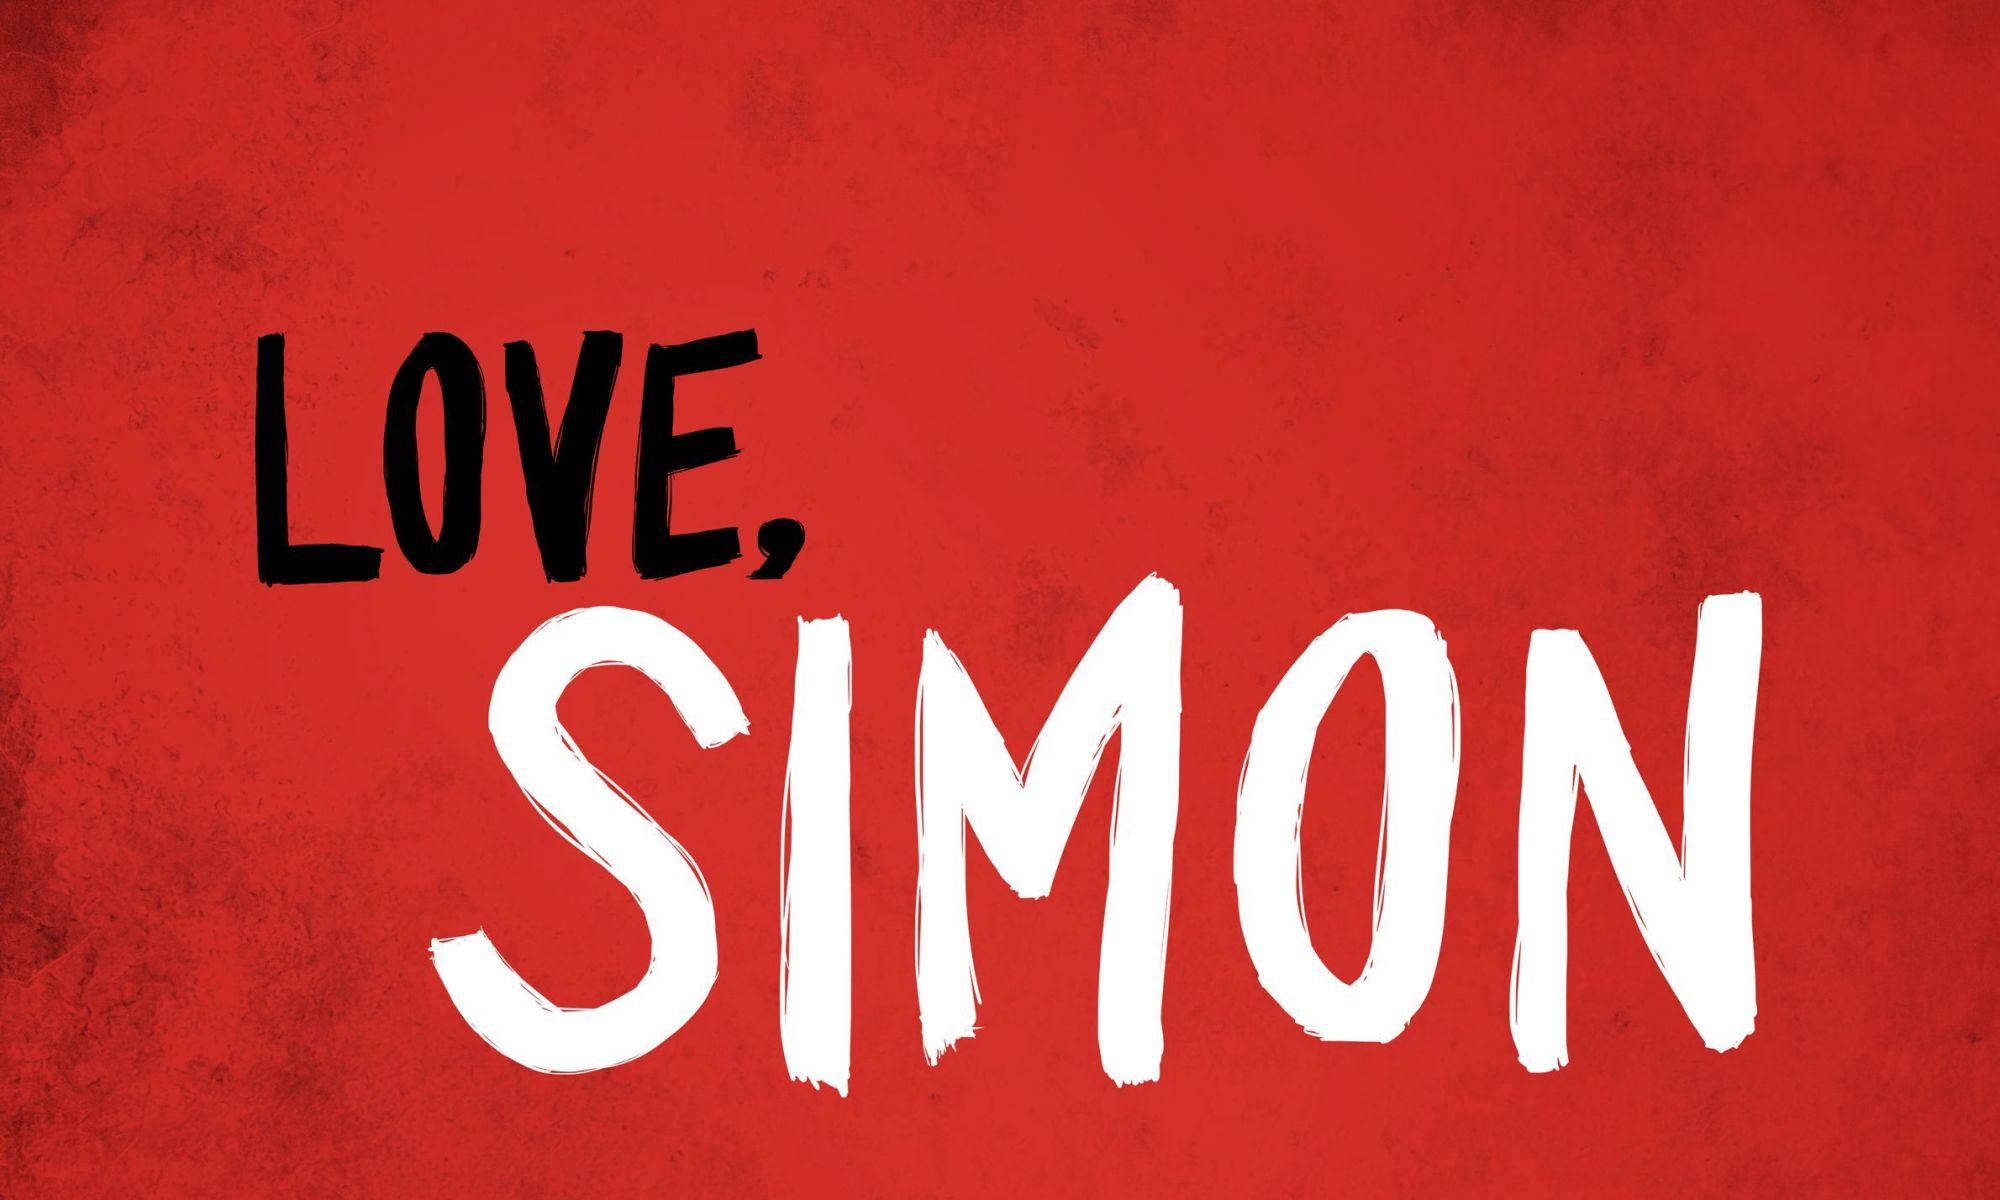 love, simon score